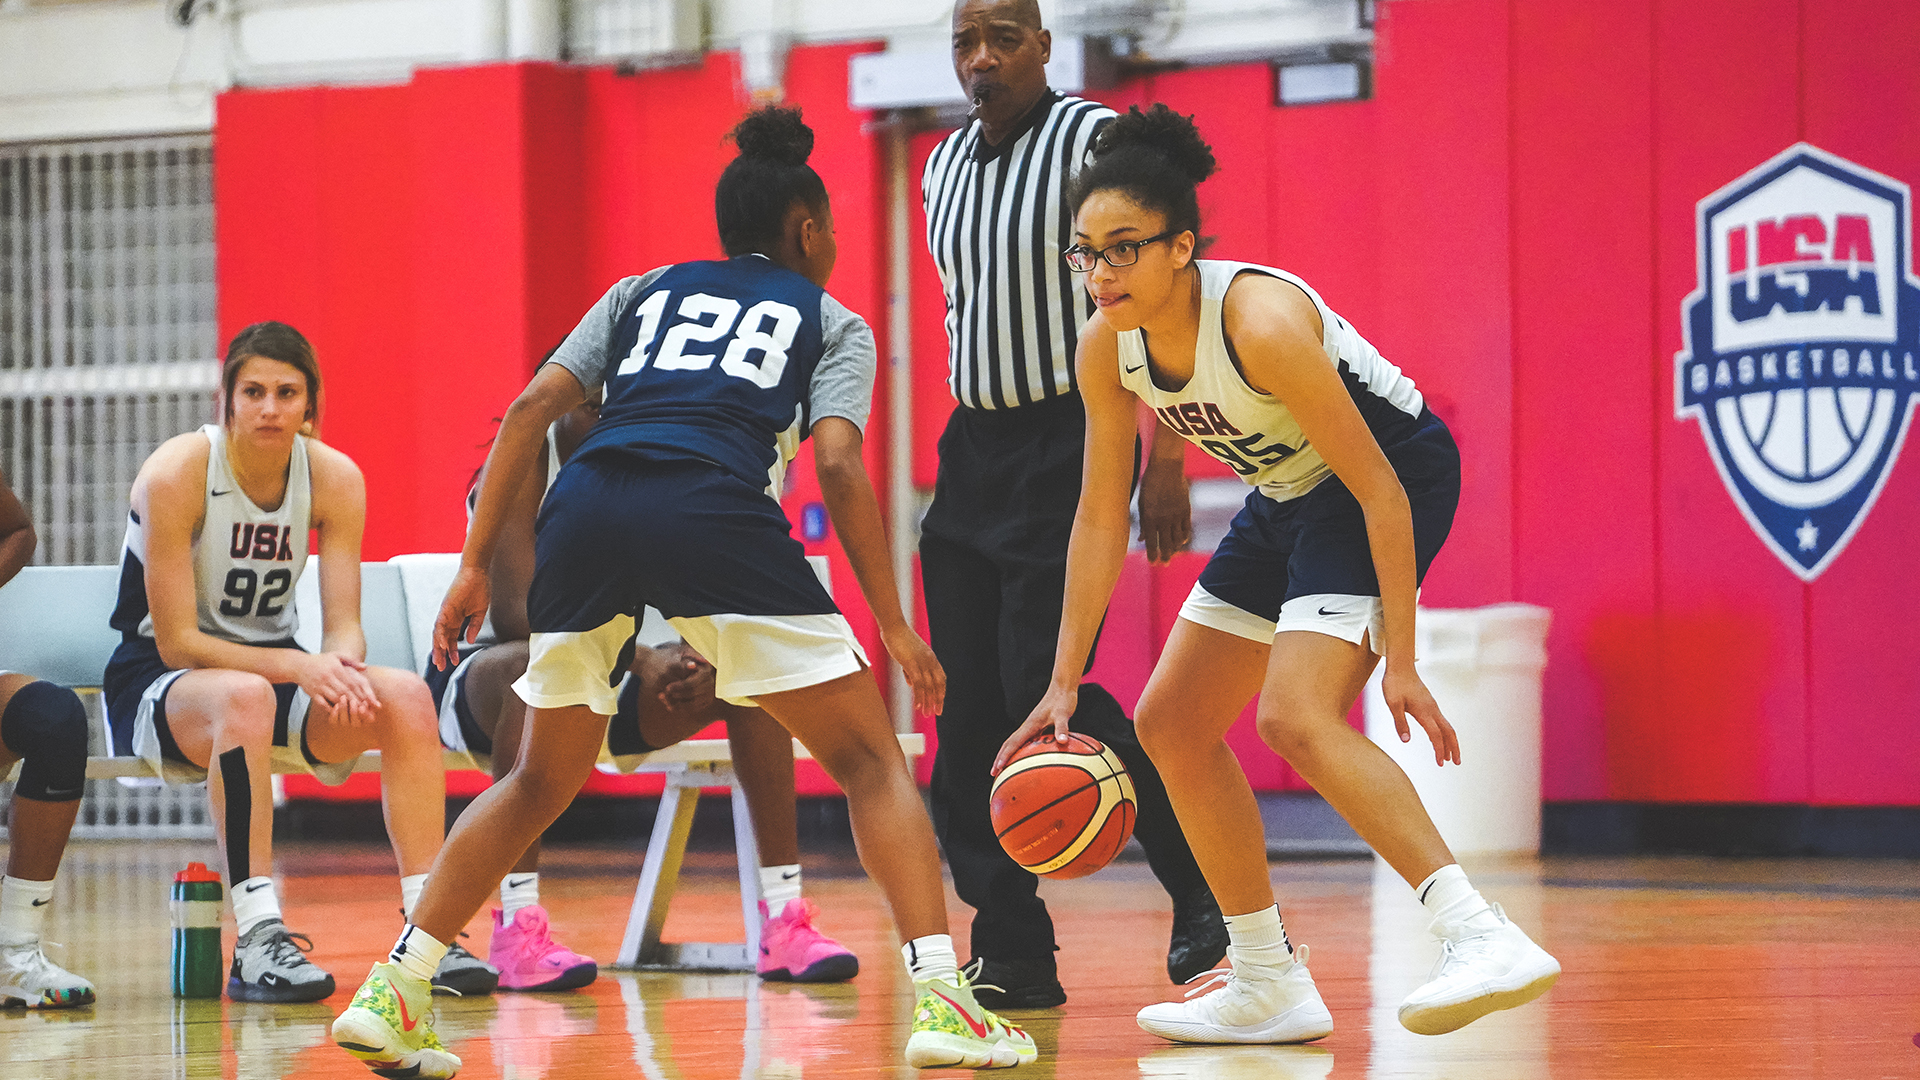 Roster announced for USA Basketball Women's U16 National Team